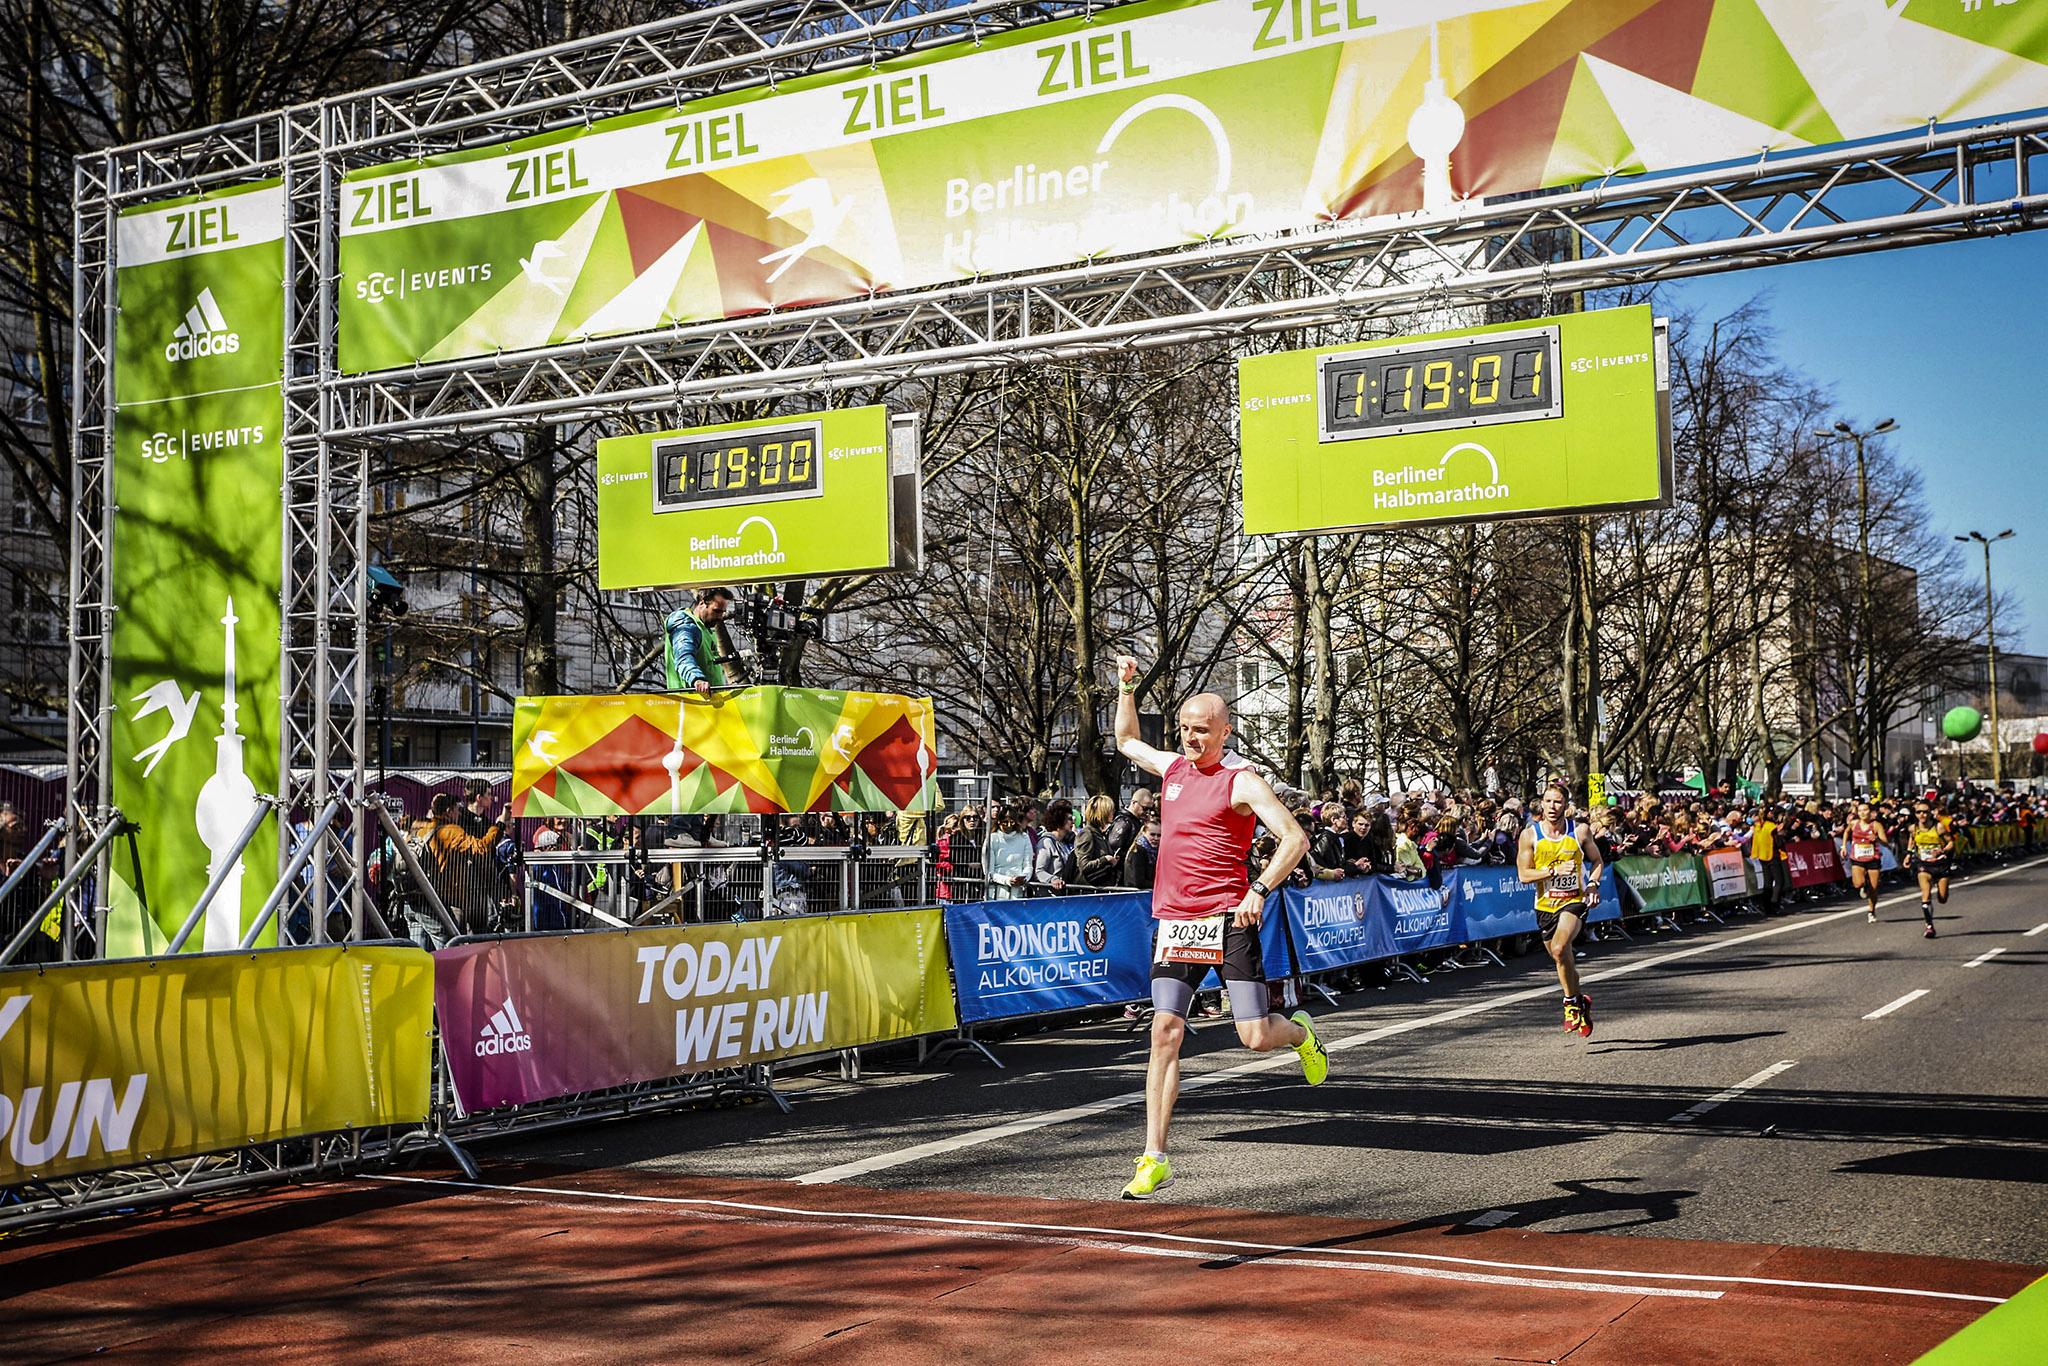 Berlin Half Marathon only travelers left alive